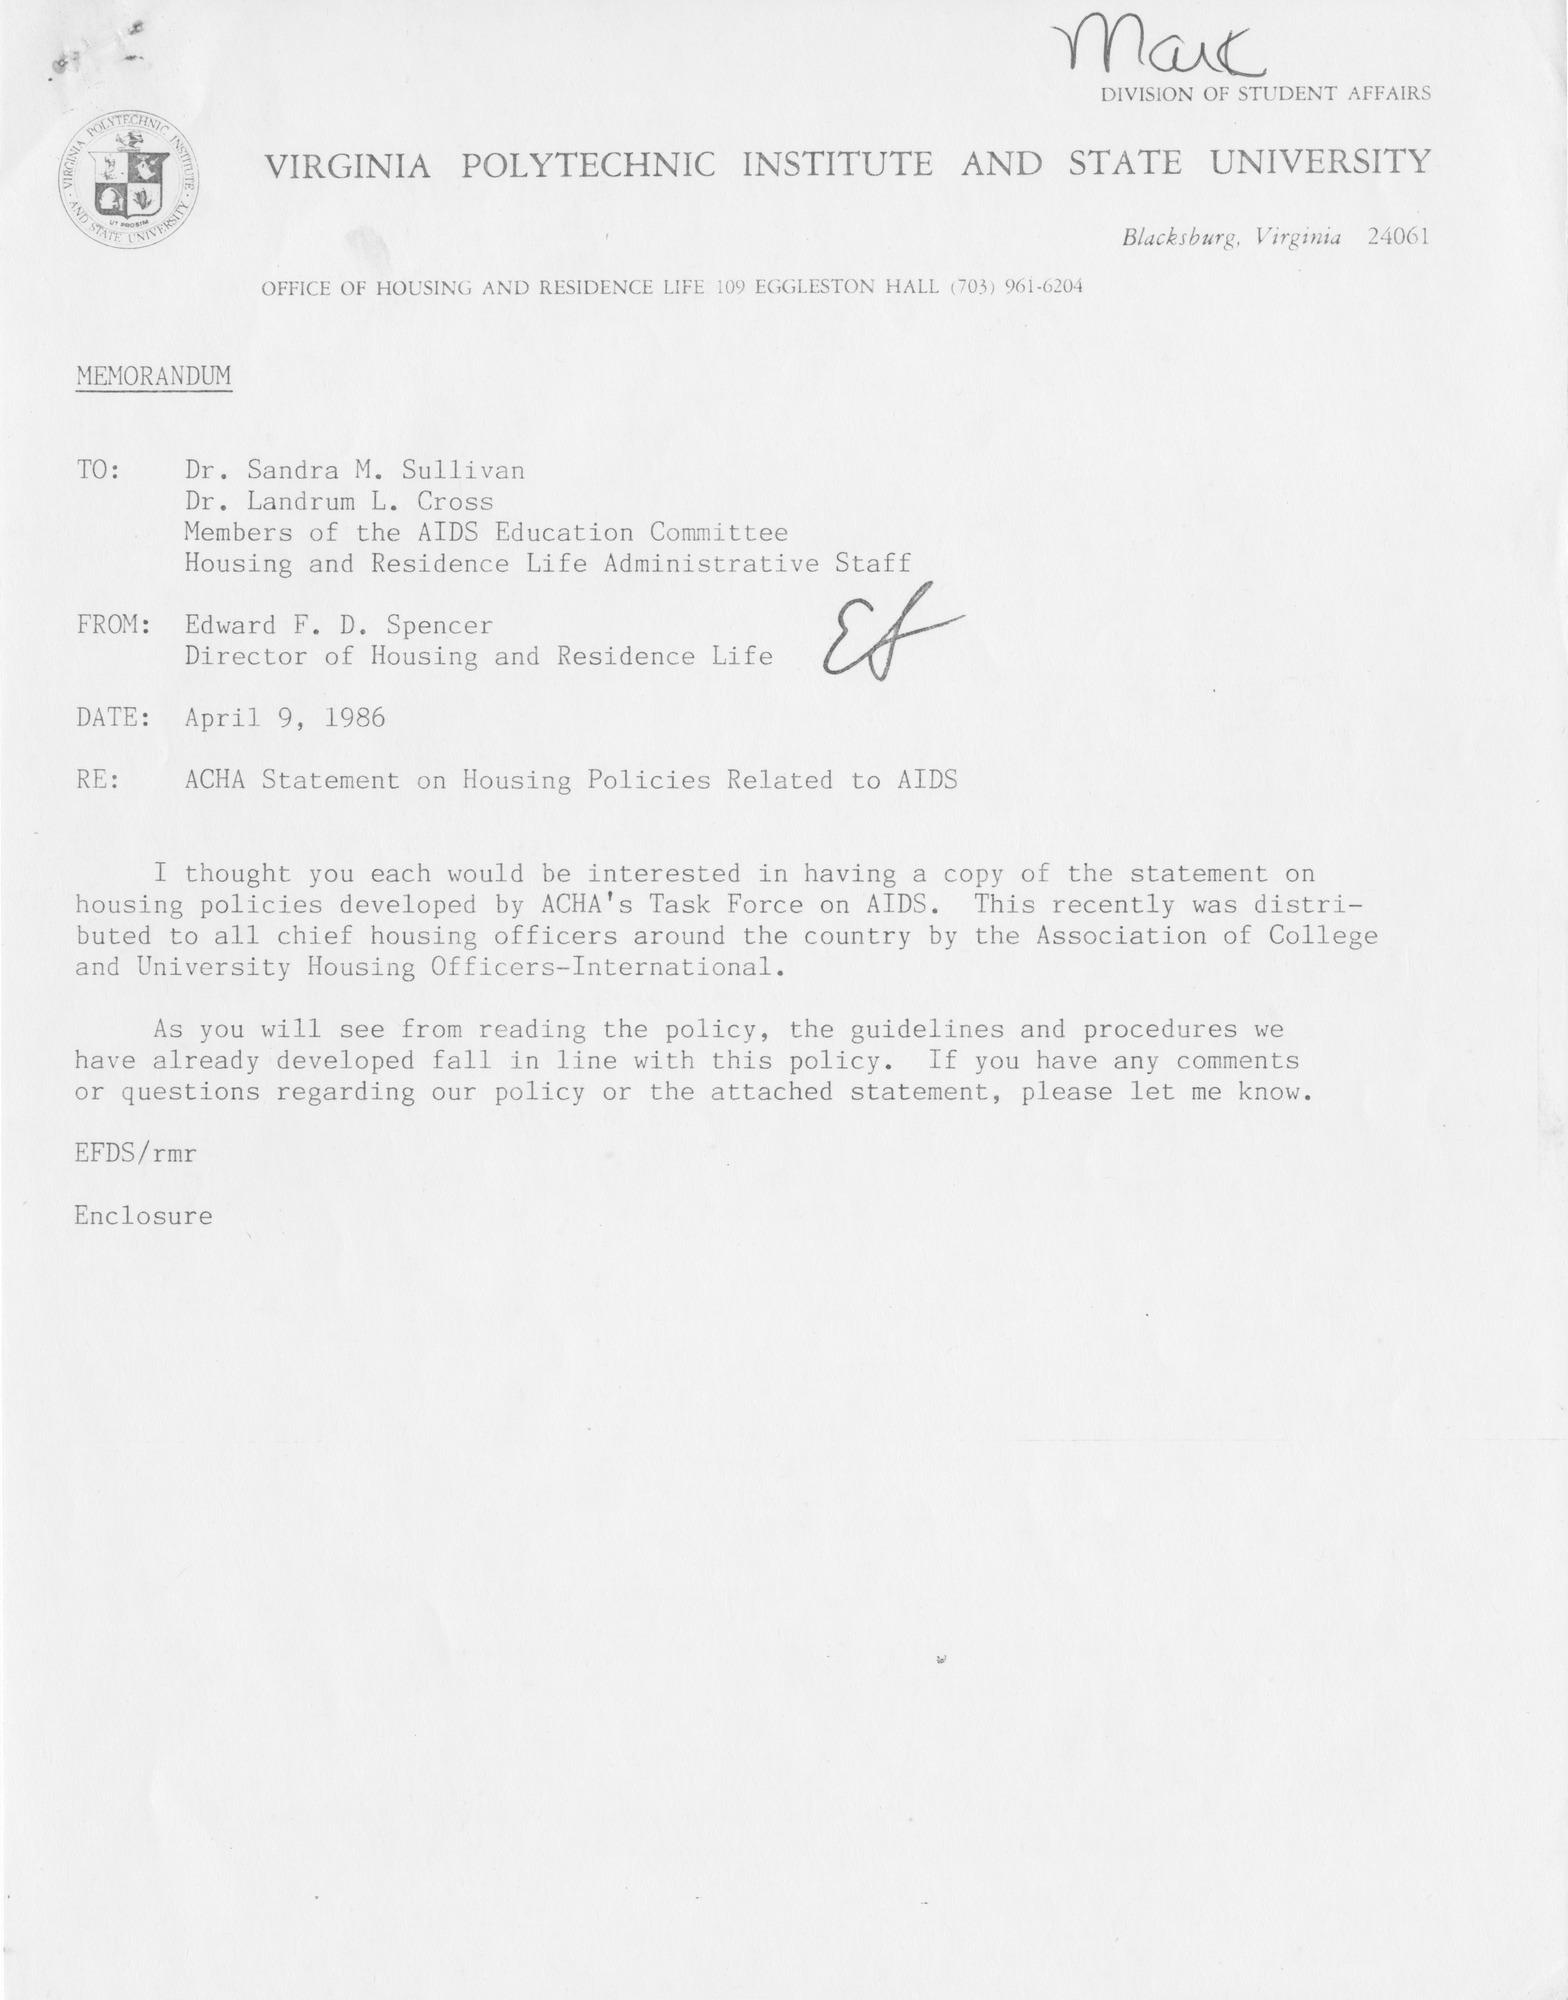 Ms2014-010_WeberMark_CorrespondenceEdSpencer_1986_0409a.jpg